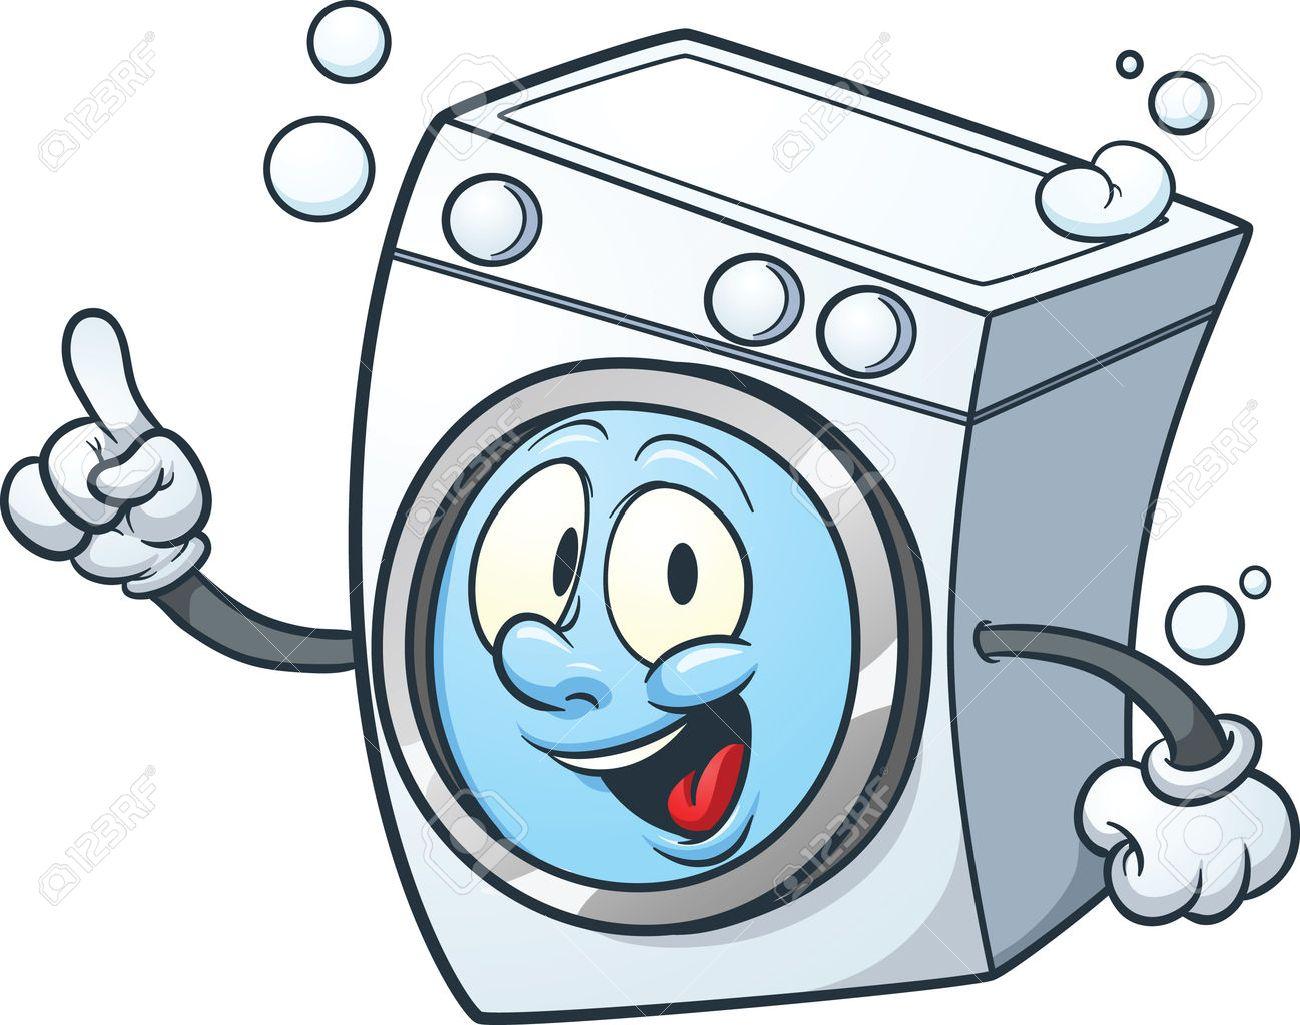 Cartoon Washing Machine Clipart.